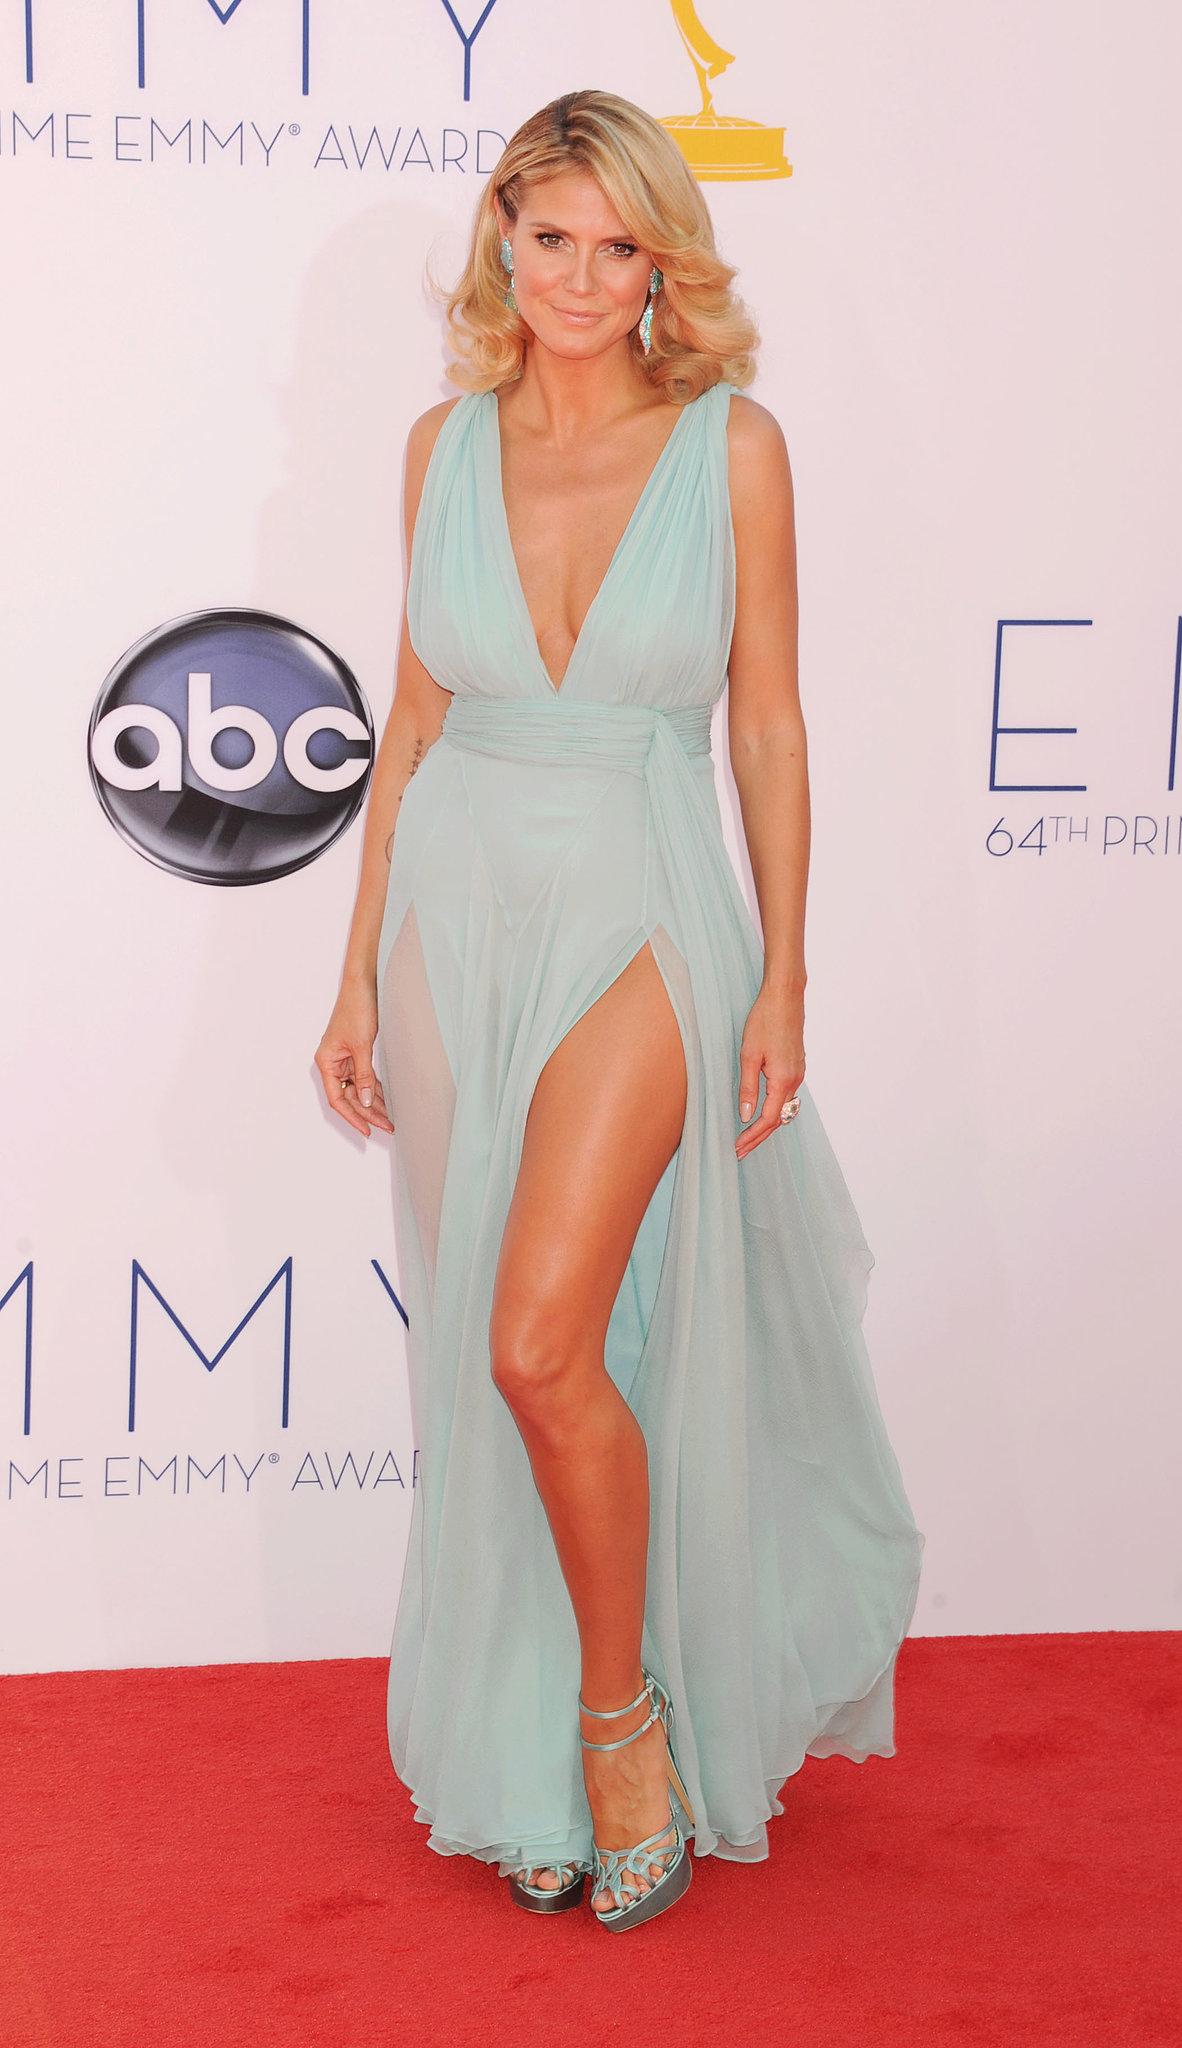 Heidi Klum in Alexandre Vauthier at the 2012 Emmy Awards